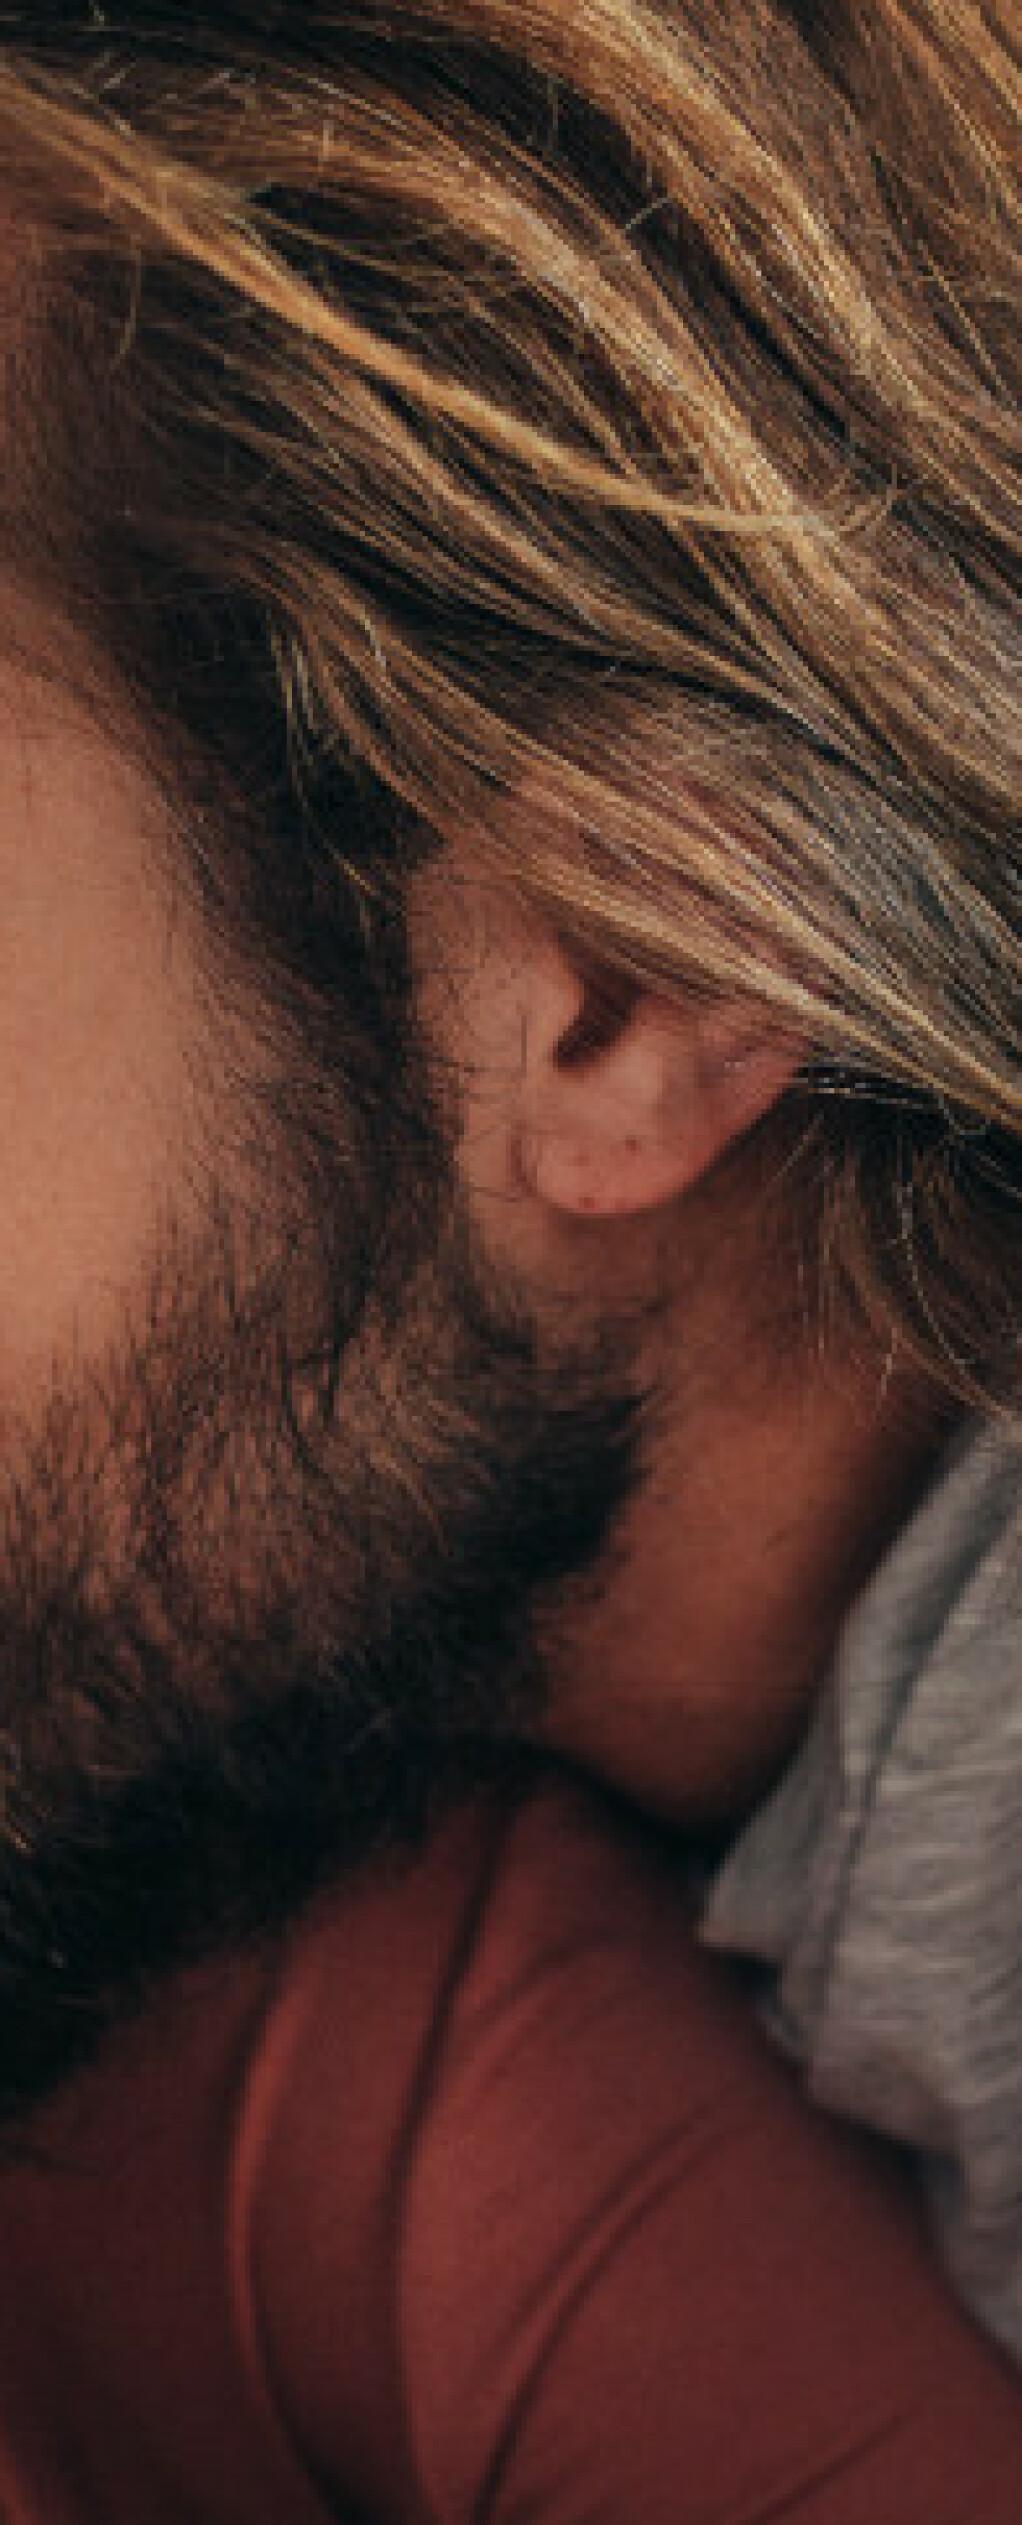 - Mange sover dårligere når de sover sammen med noen